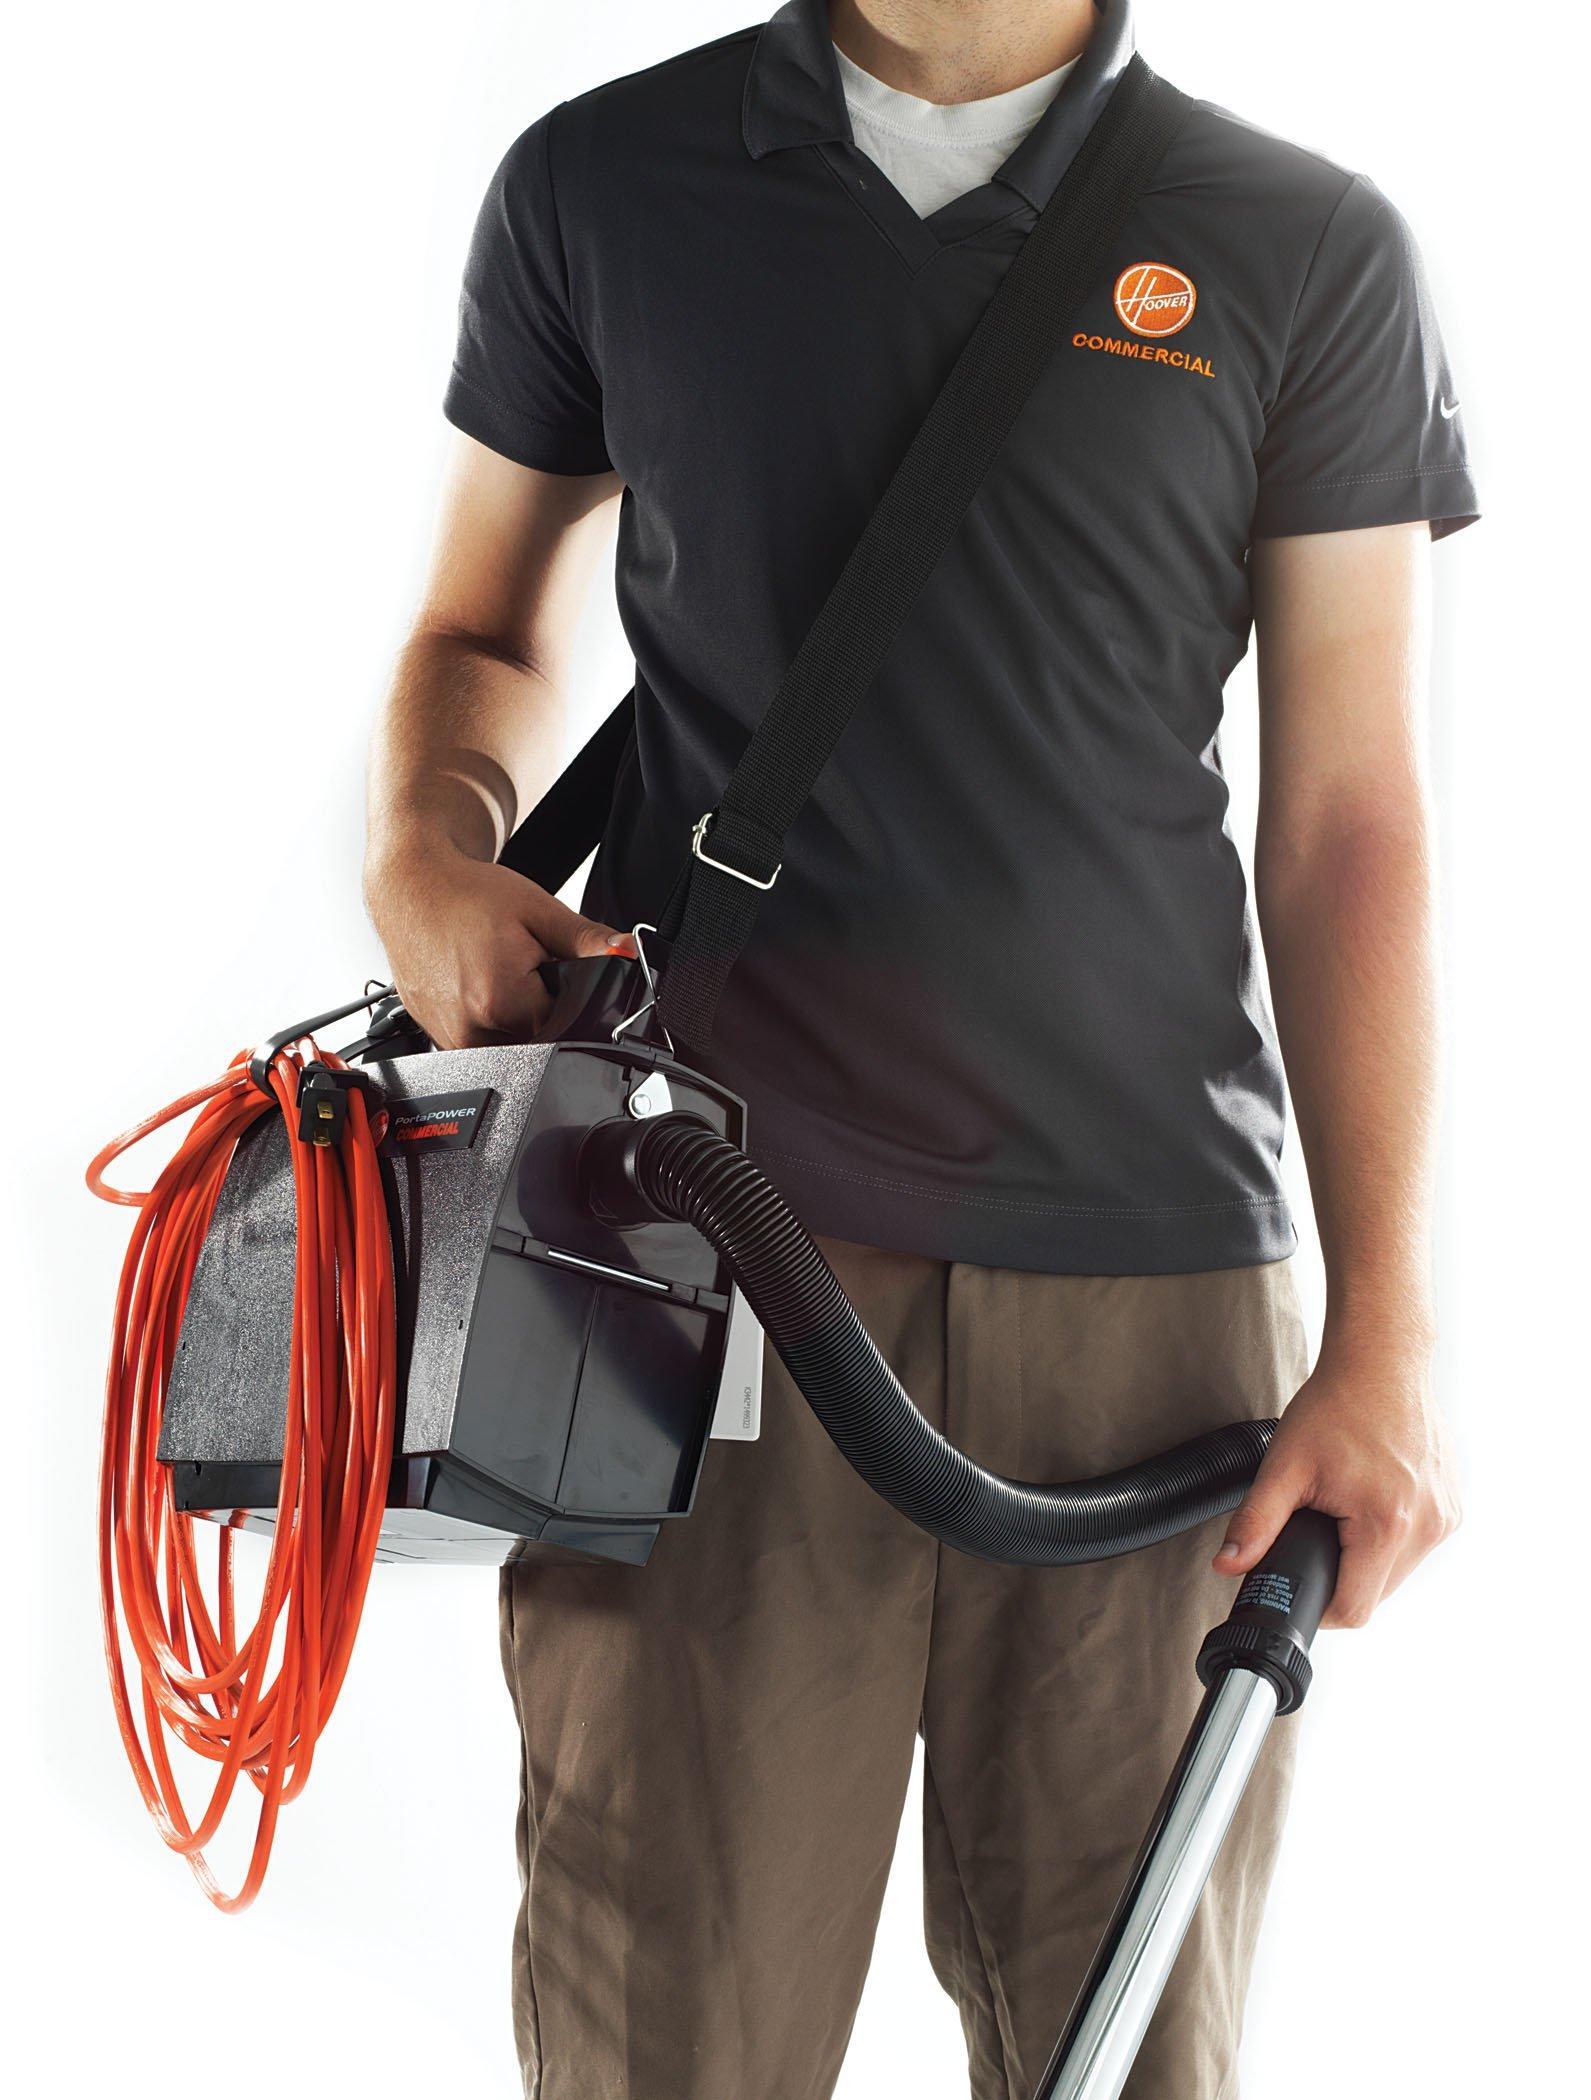 PortaPOWER Lightweight Vacuum Cleaner2